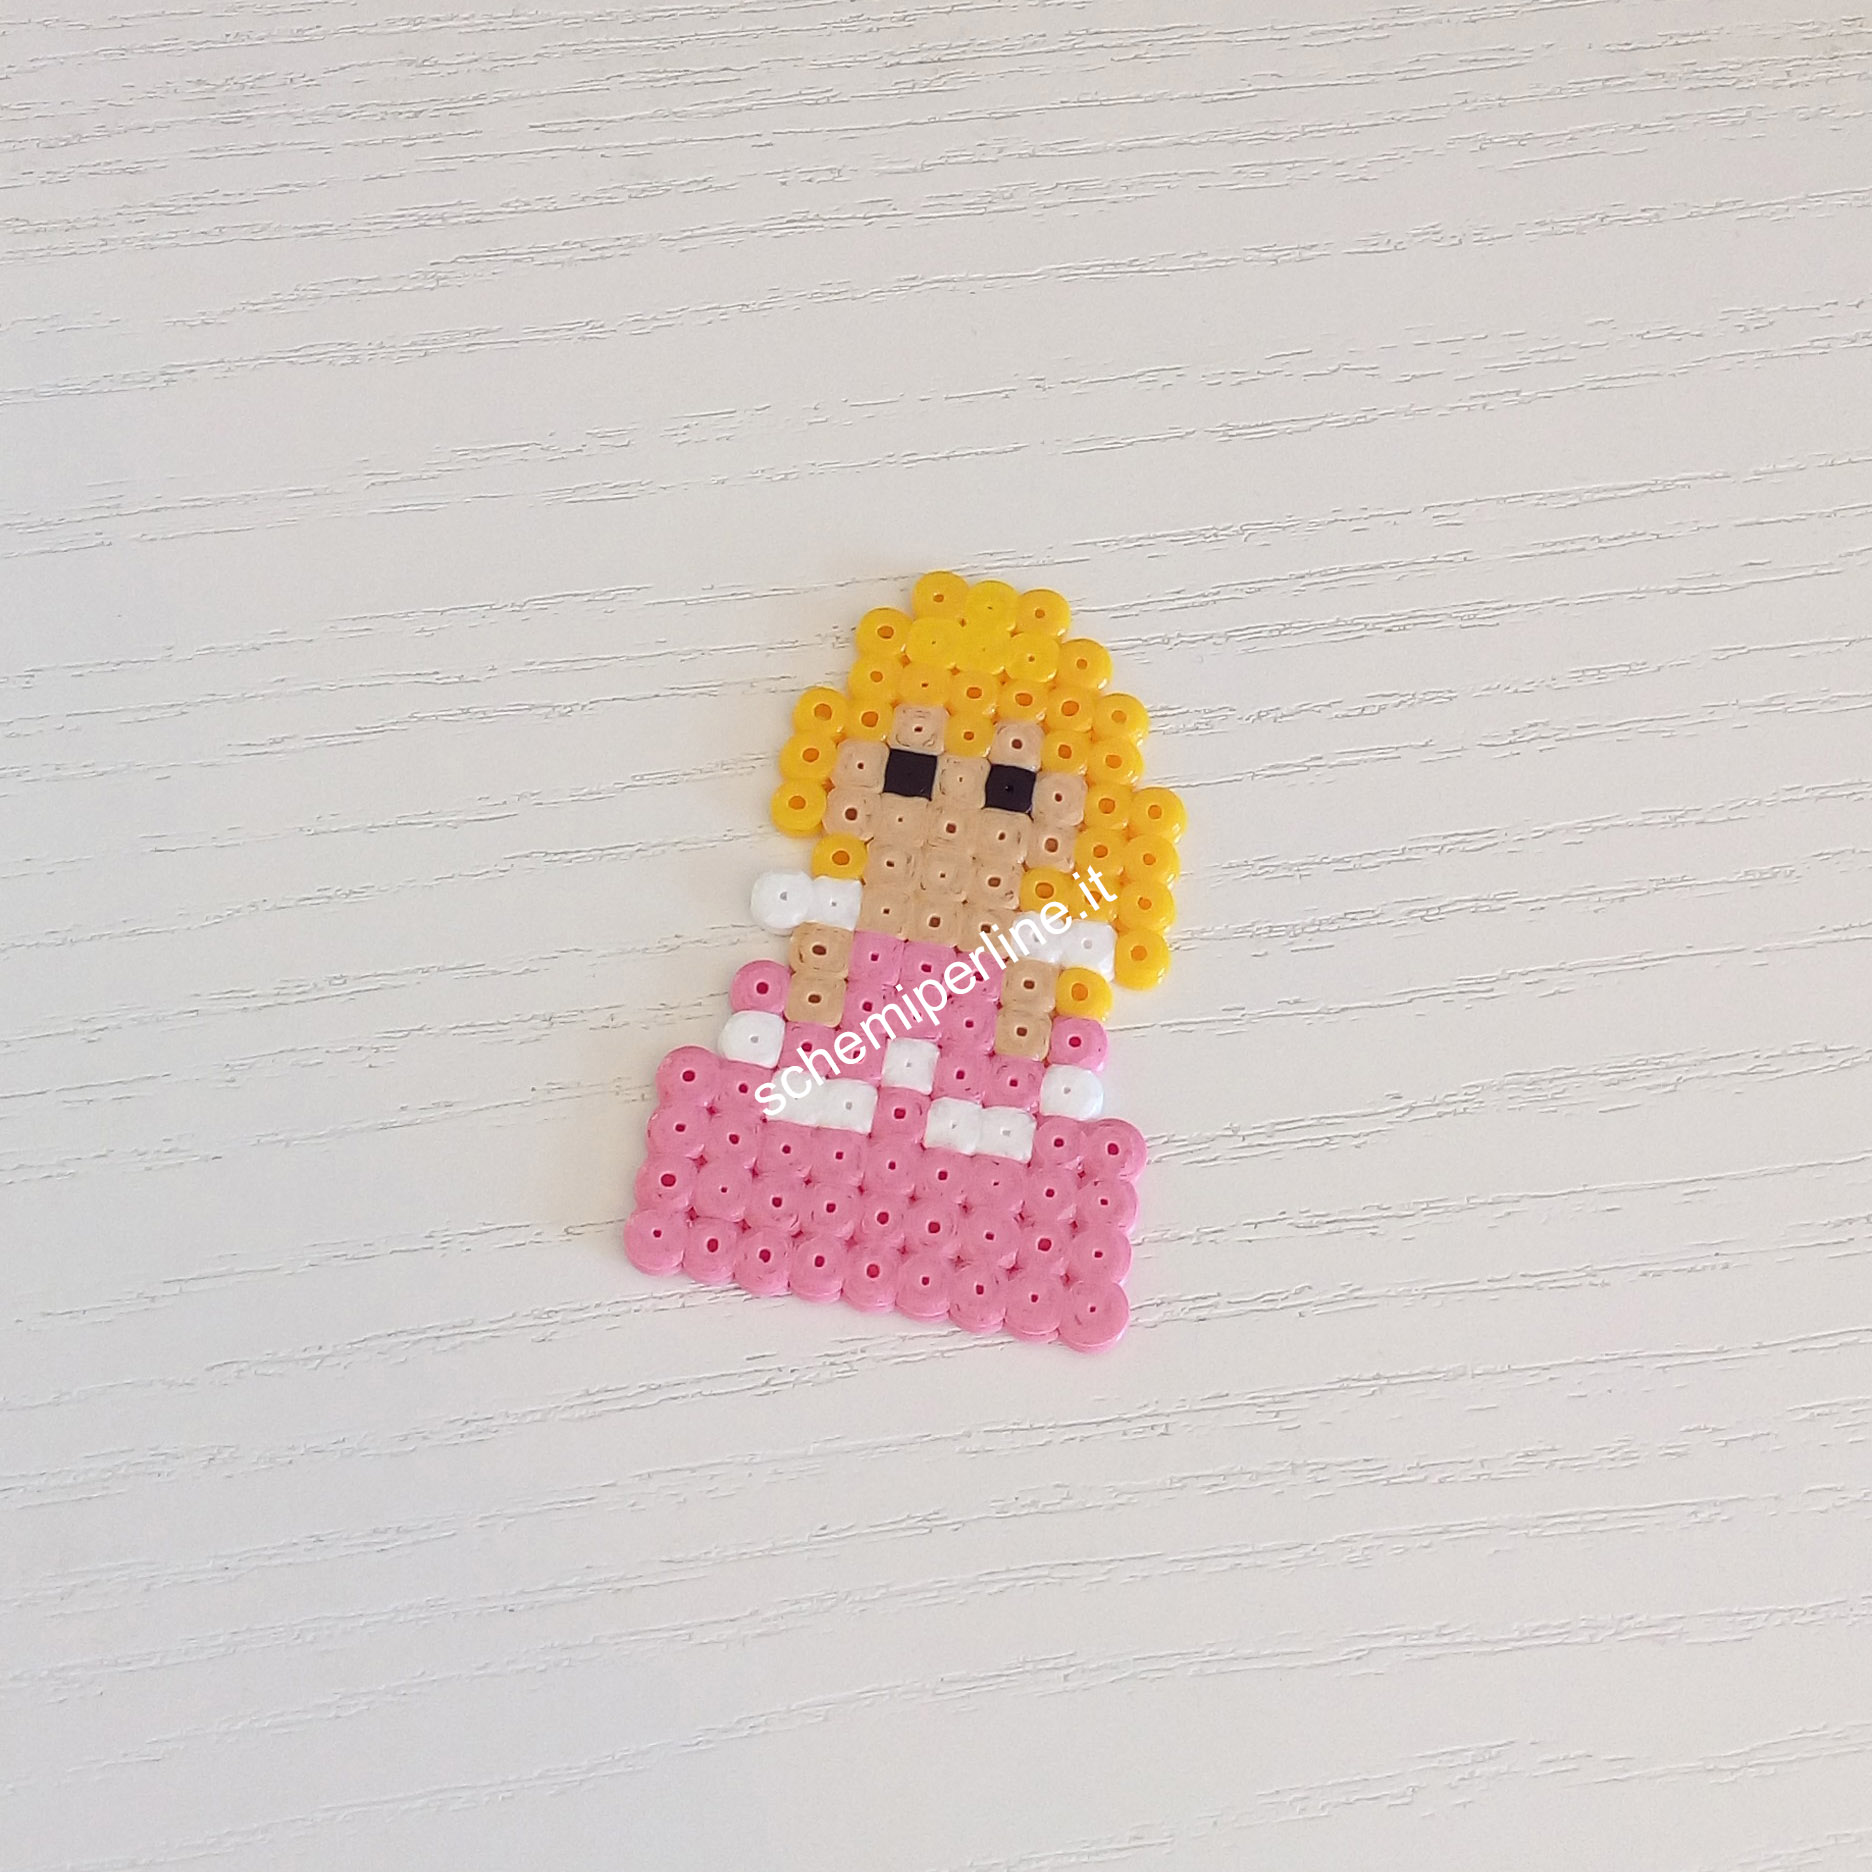 Aurora Mini Principessa Disney foto lavoro Pyssla